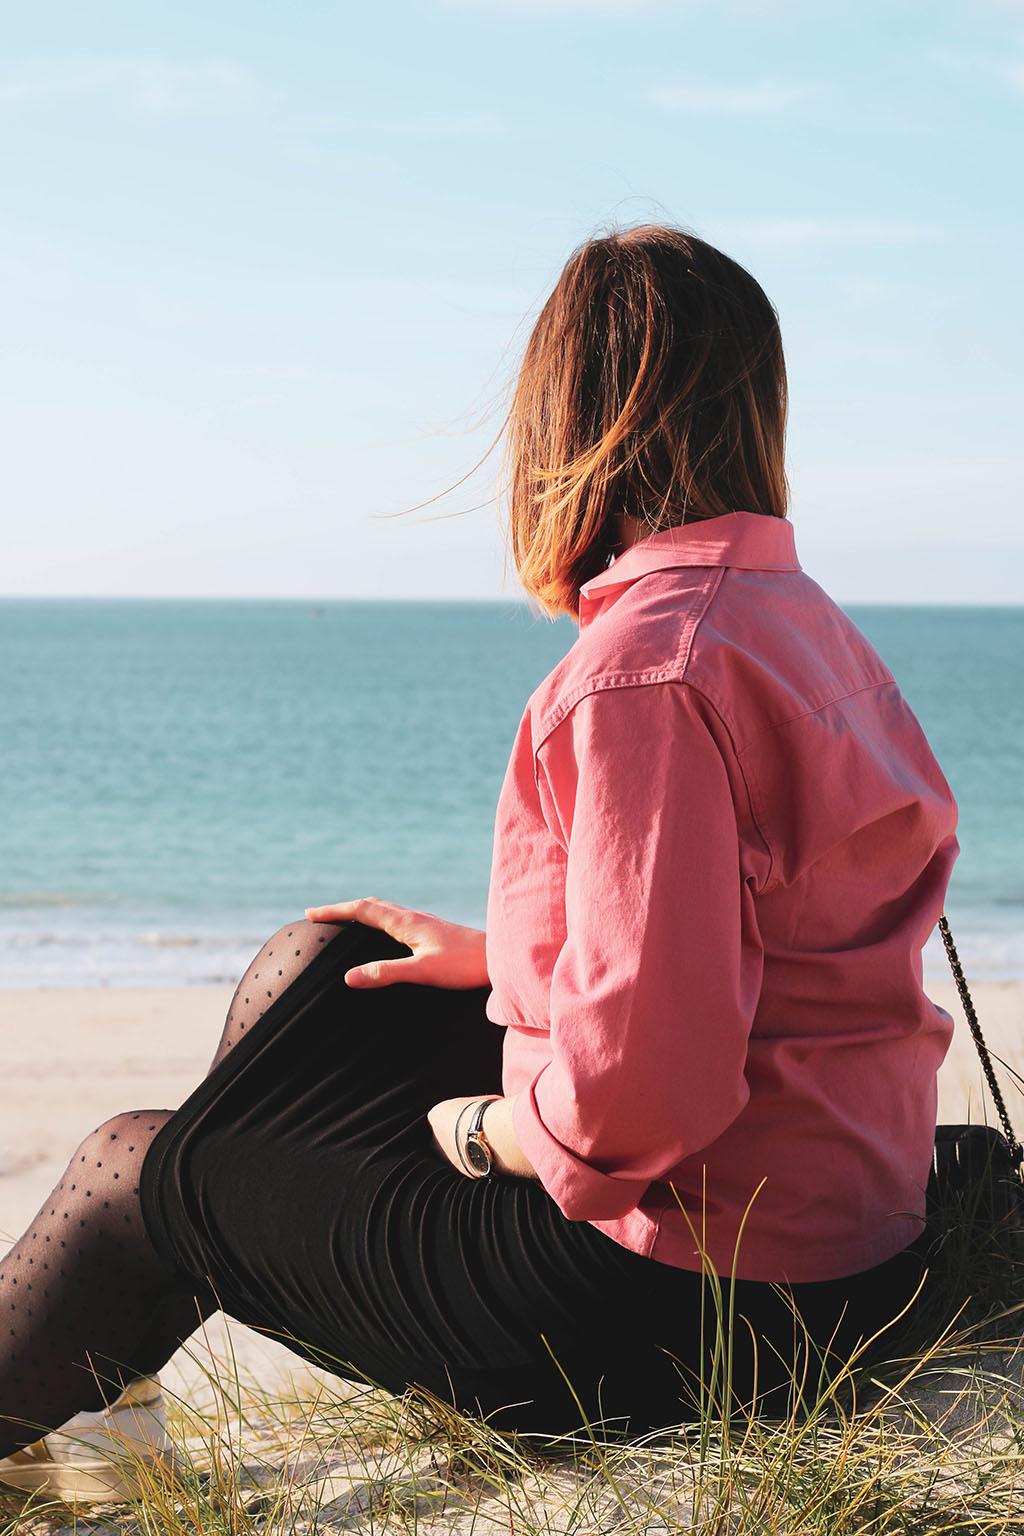 vareuse rose à la mer